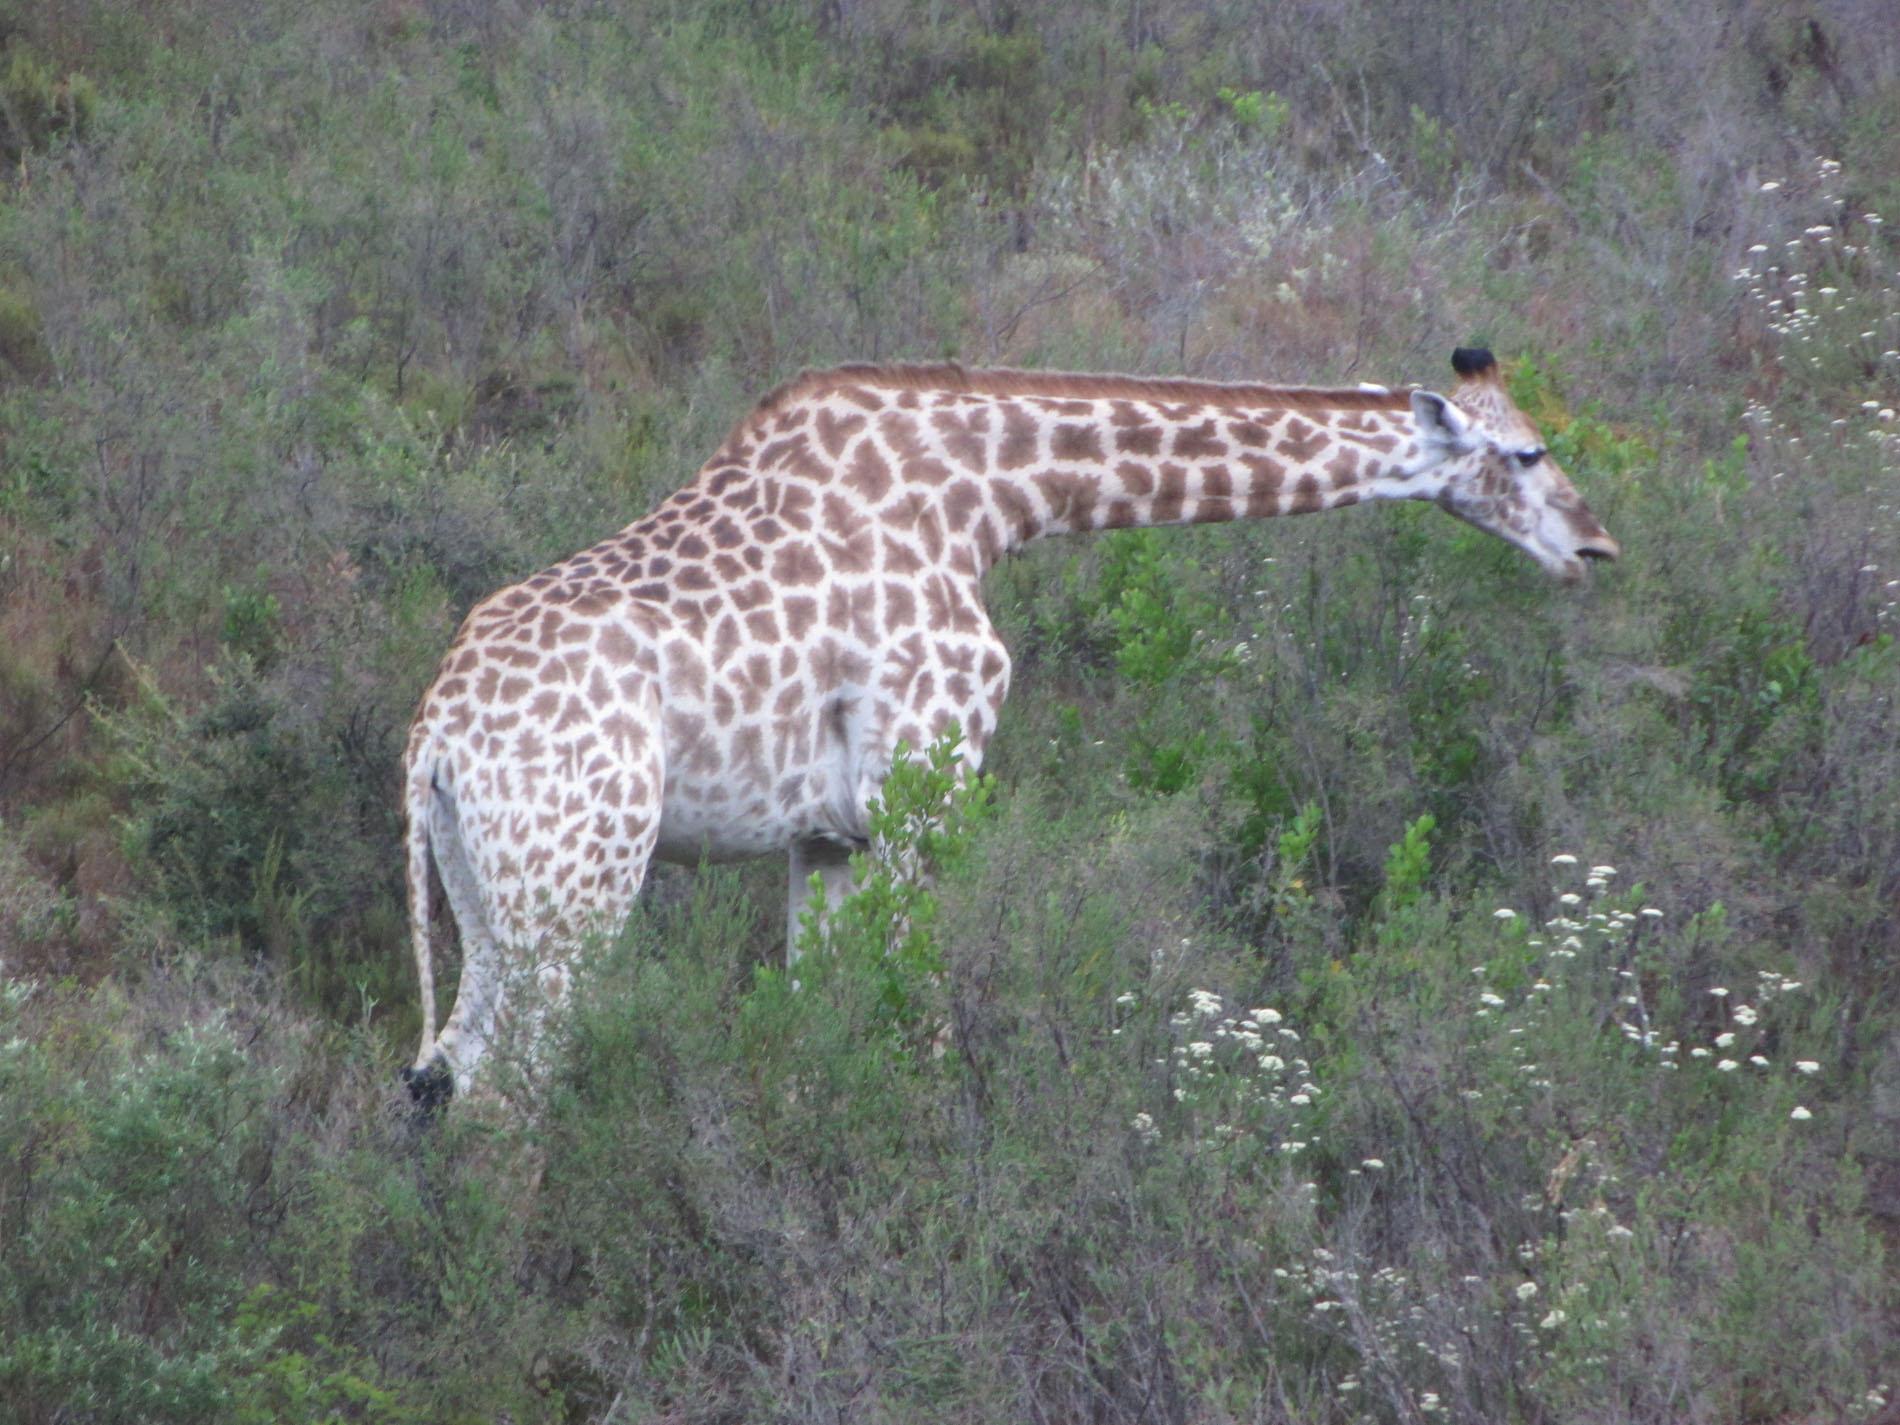 Giraffe im Gondwana Game Reserve